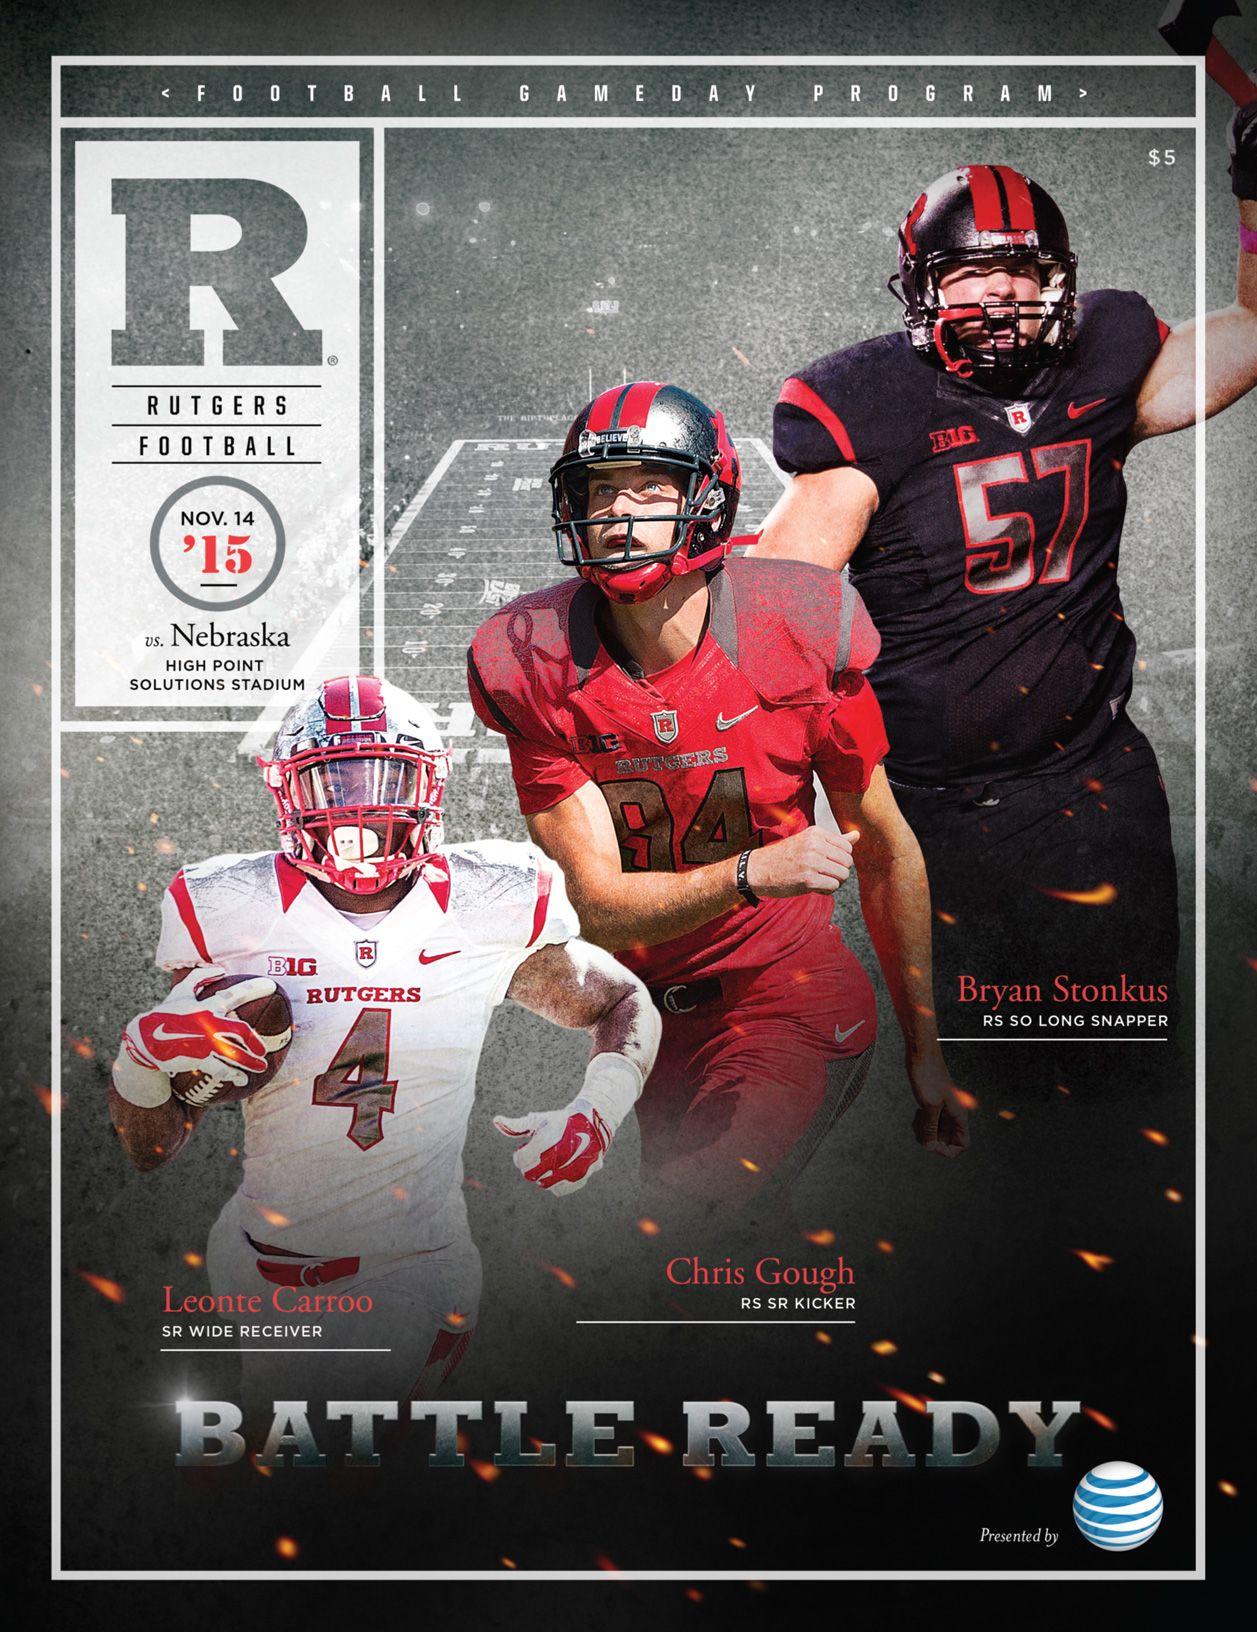 The Official 2015 Rutgers Football Gameday Program Vs Nebraska On November 14 2015 Features Leonte Carroo Rutgers Football Rutgers Rutgers Scarlet Knights